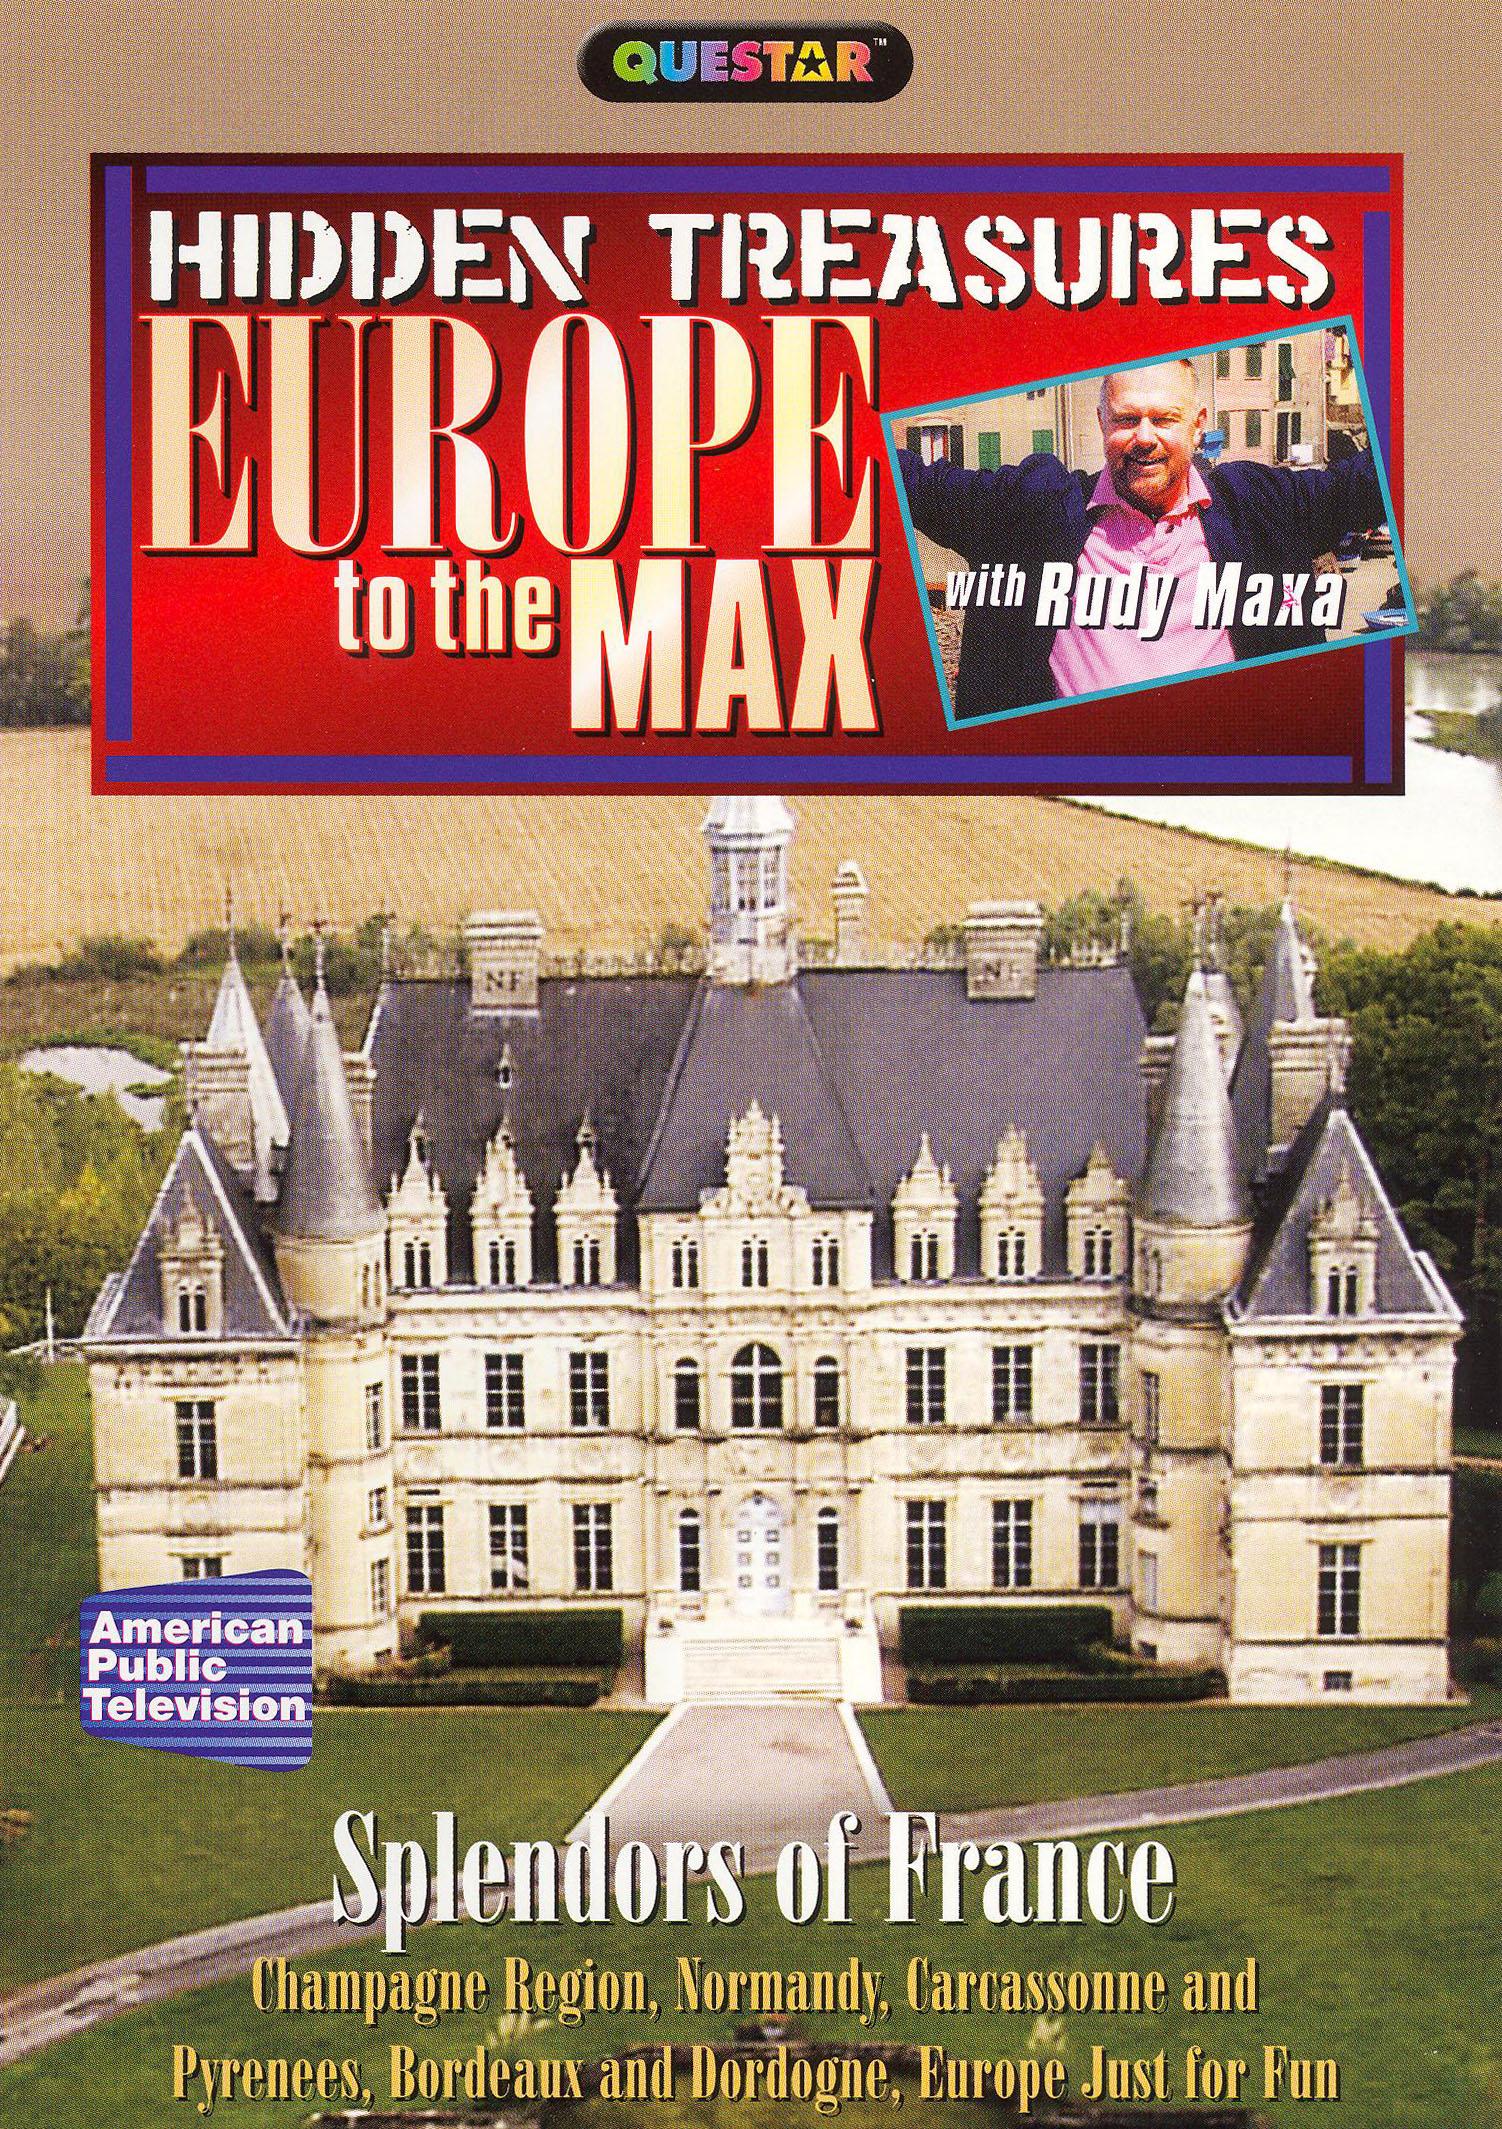 Rudy Maxa: Europe to the Max: Hidden Treasures - Splendors of France